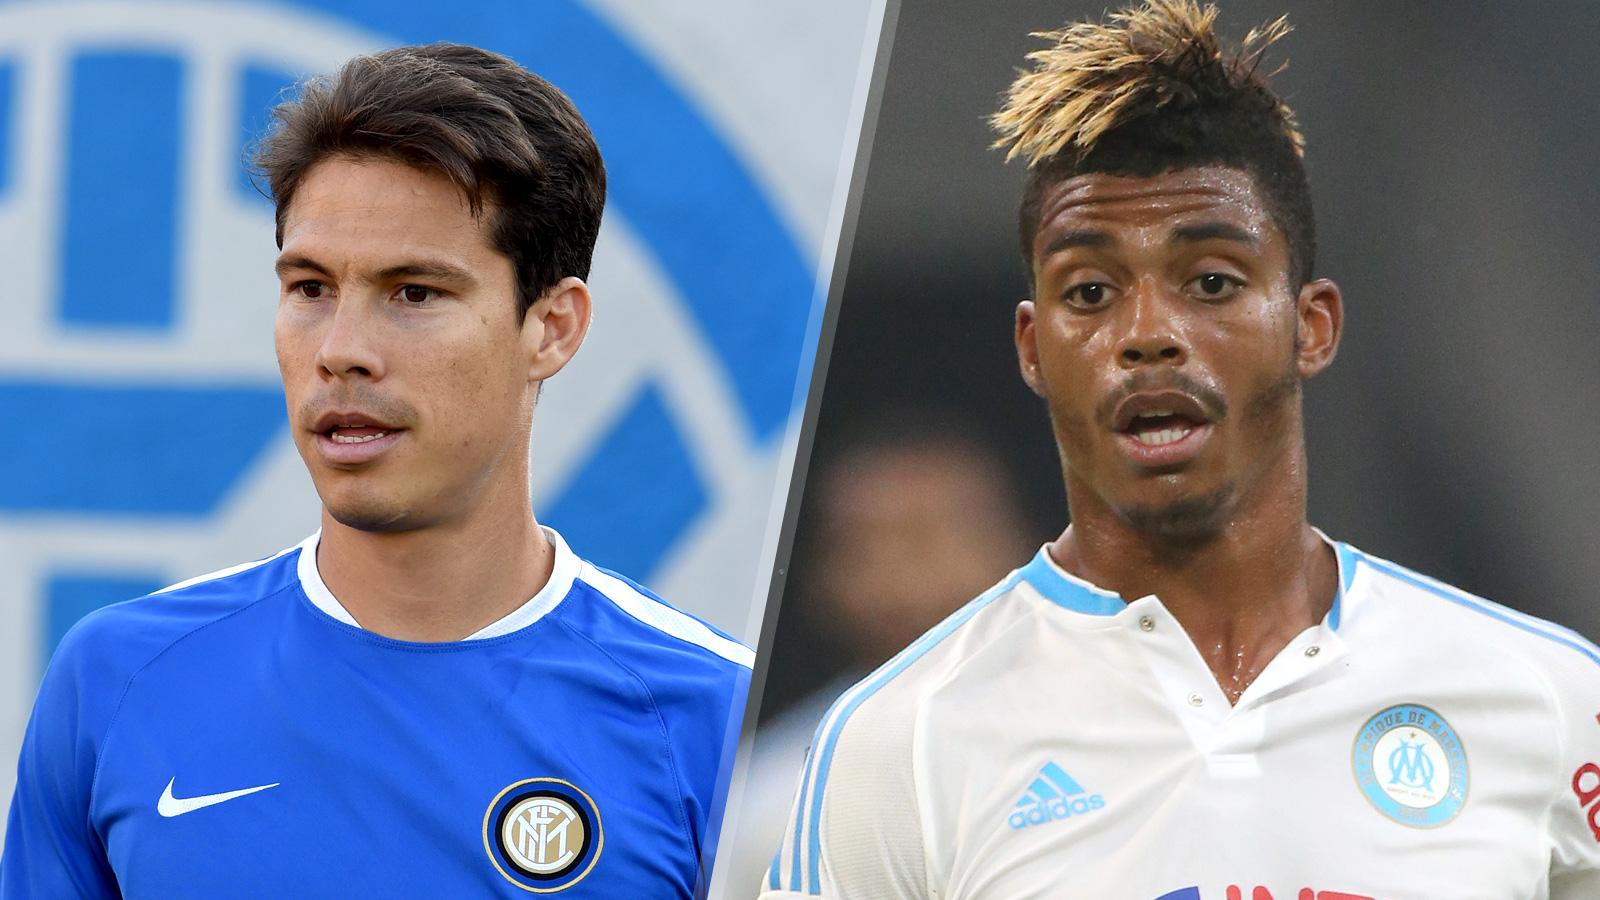 Juventus finalize deals with midfielders Hernanes and Lemina